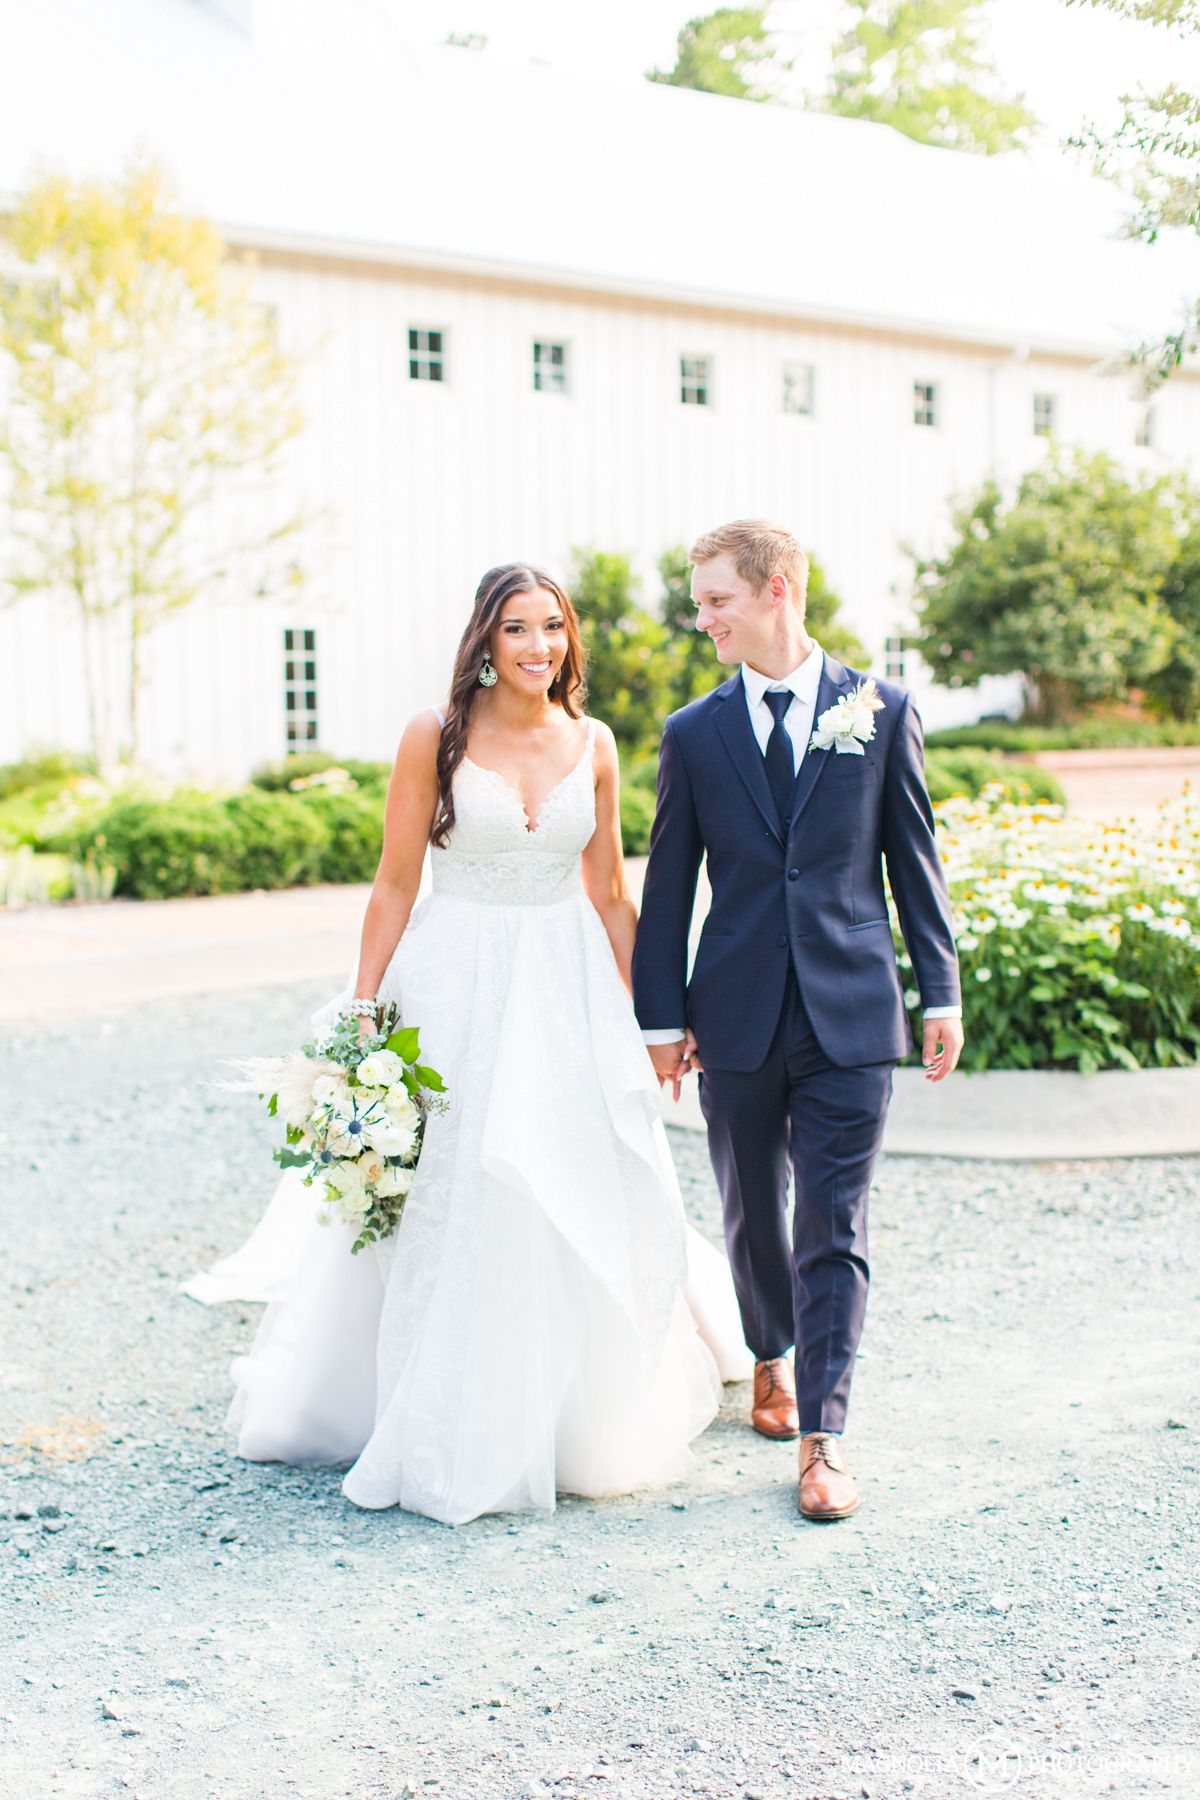 The Barn of Chapel Hill Wedding Photographer | Kaitlyn + Turner Married